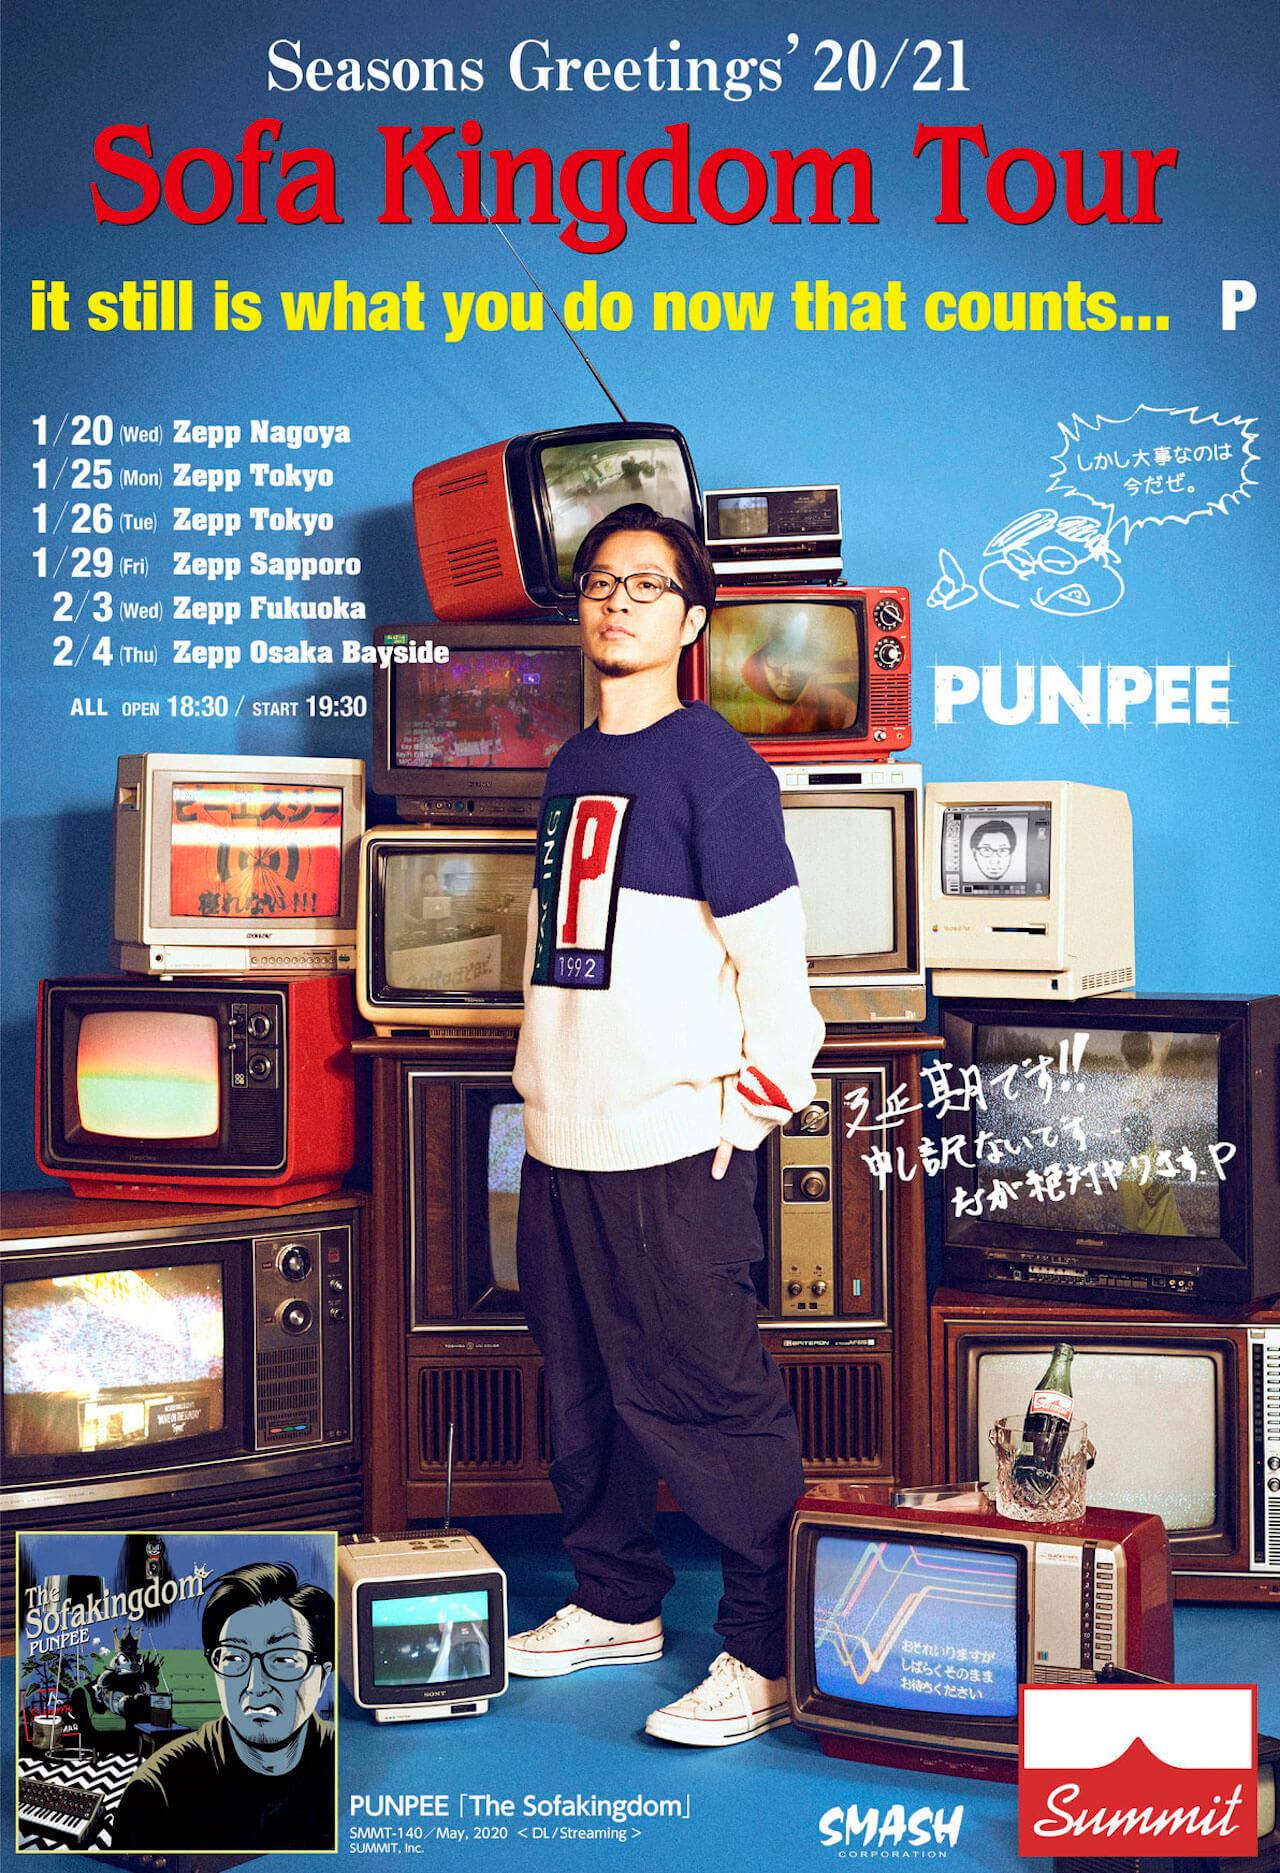 PUNPEEが5曲入りのEP『The Sofakingdom』をリリース|KREVA客演「夢追人」MVが公開 music200630-punpee-2